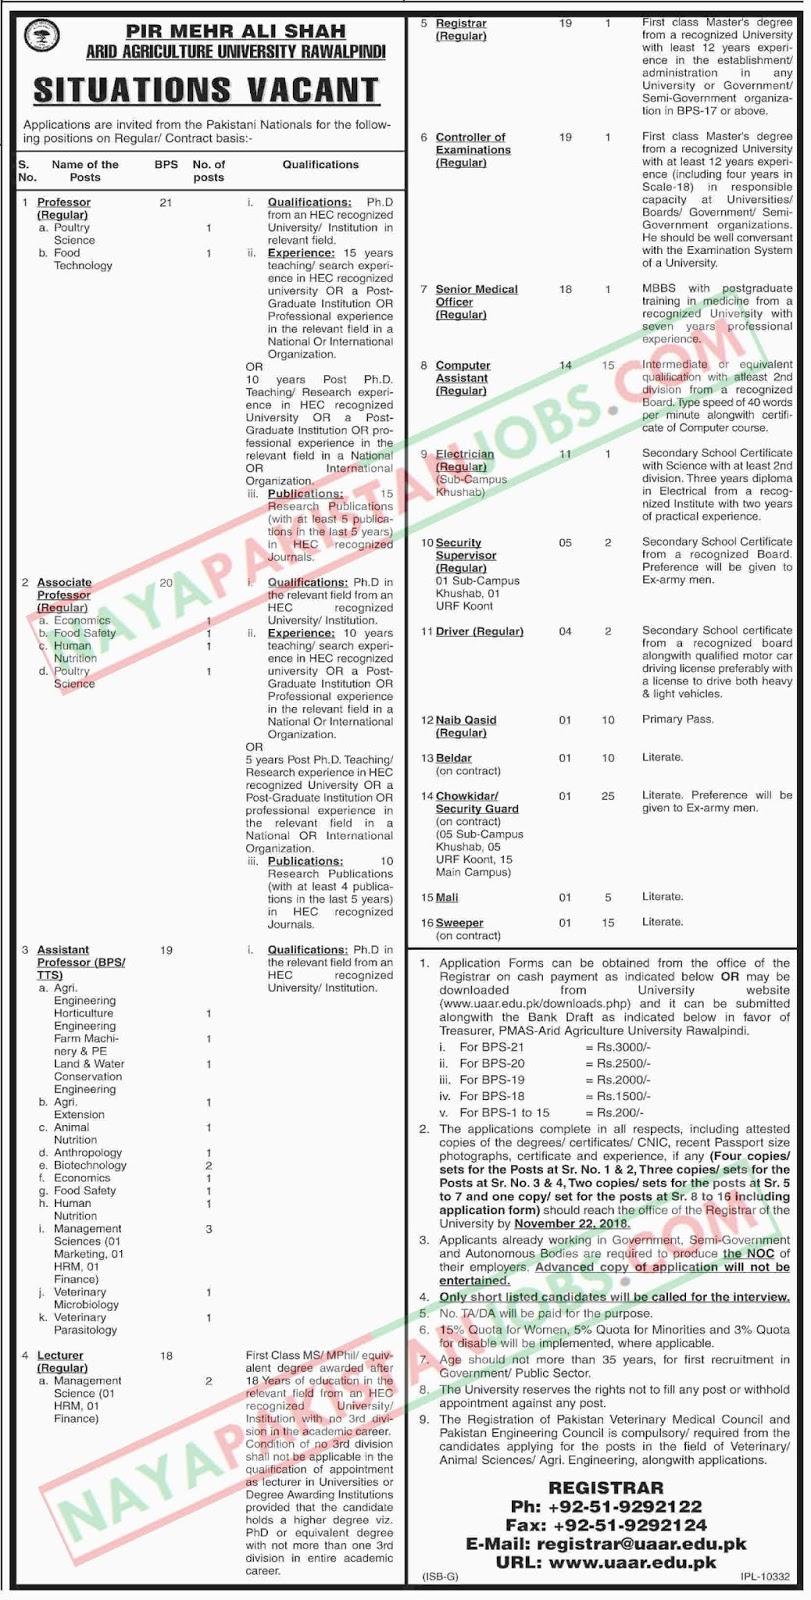 .Latest Vacancies Announced in Pir Mehar Ali Shah Arid Agriculture University 26 October 2018 - Naya Pakistan